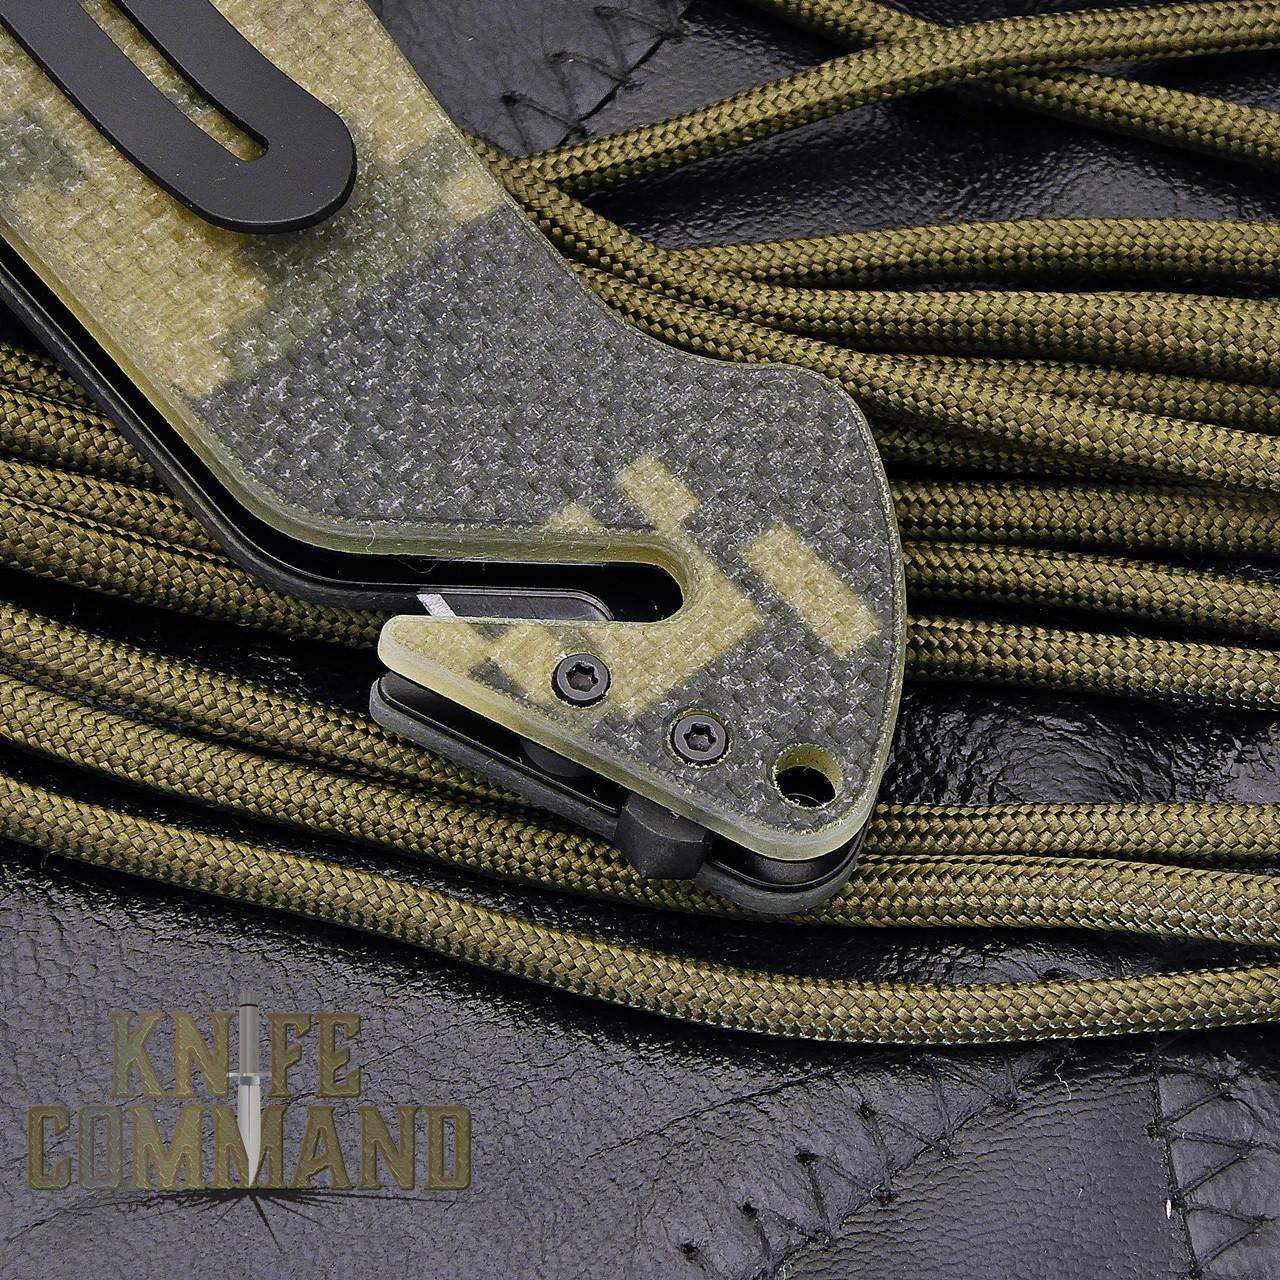 Eickhorn Solingen PRT X Digicam G10 Tanto Tactical Emergency Rescue Knife.  Glass breaker and belt cutter.